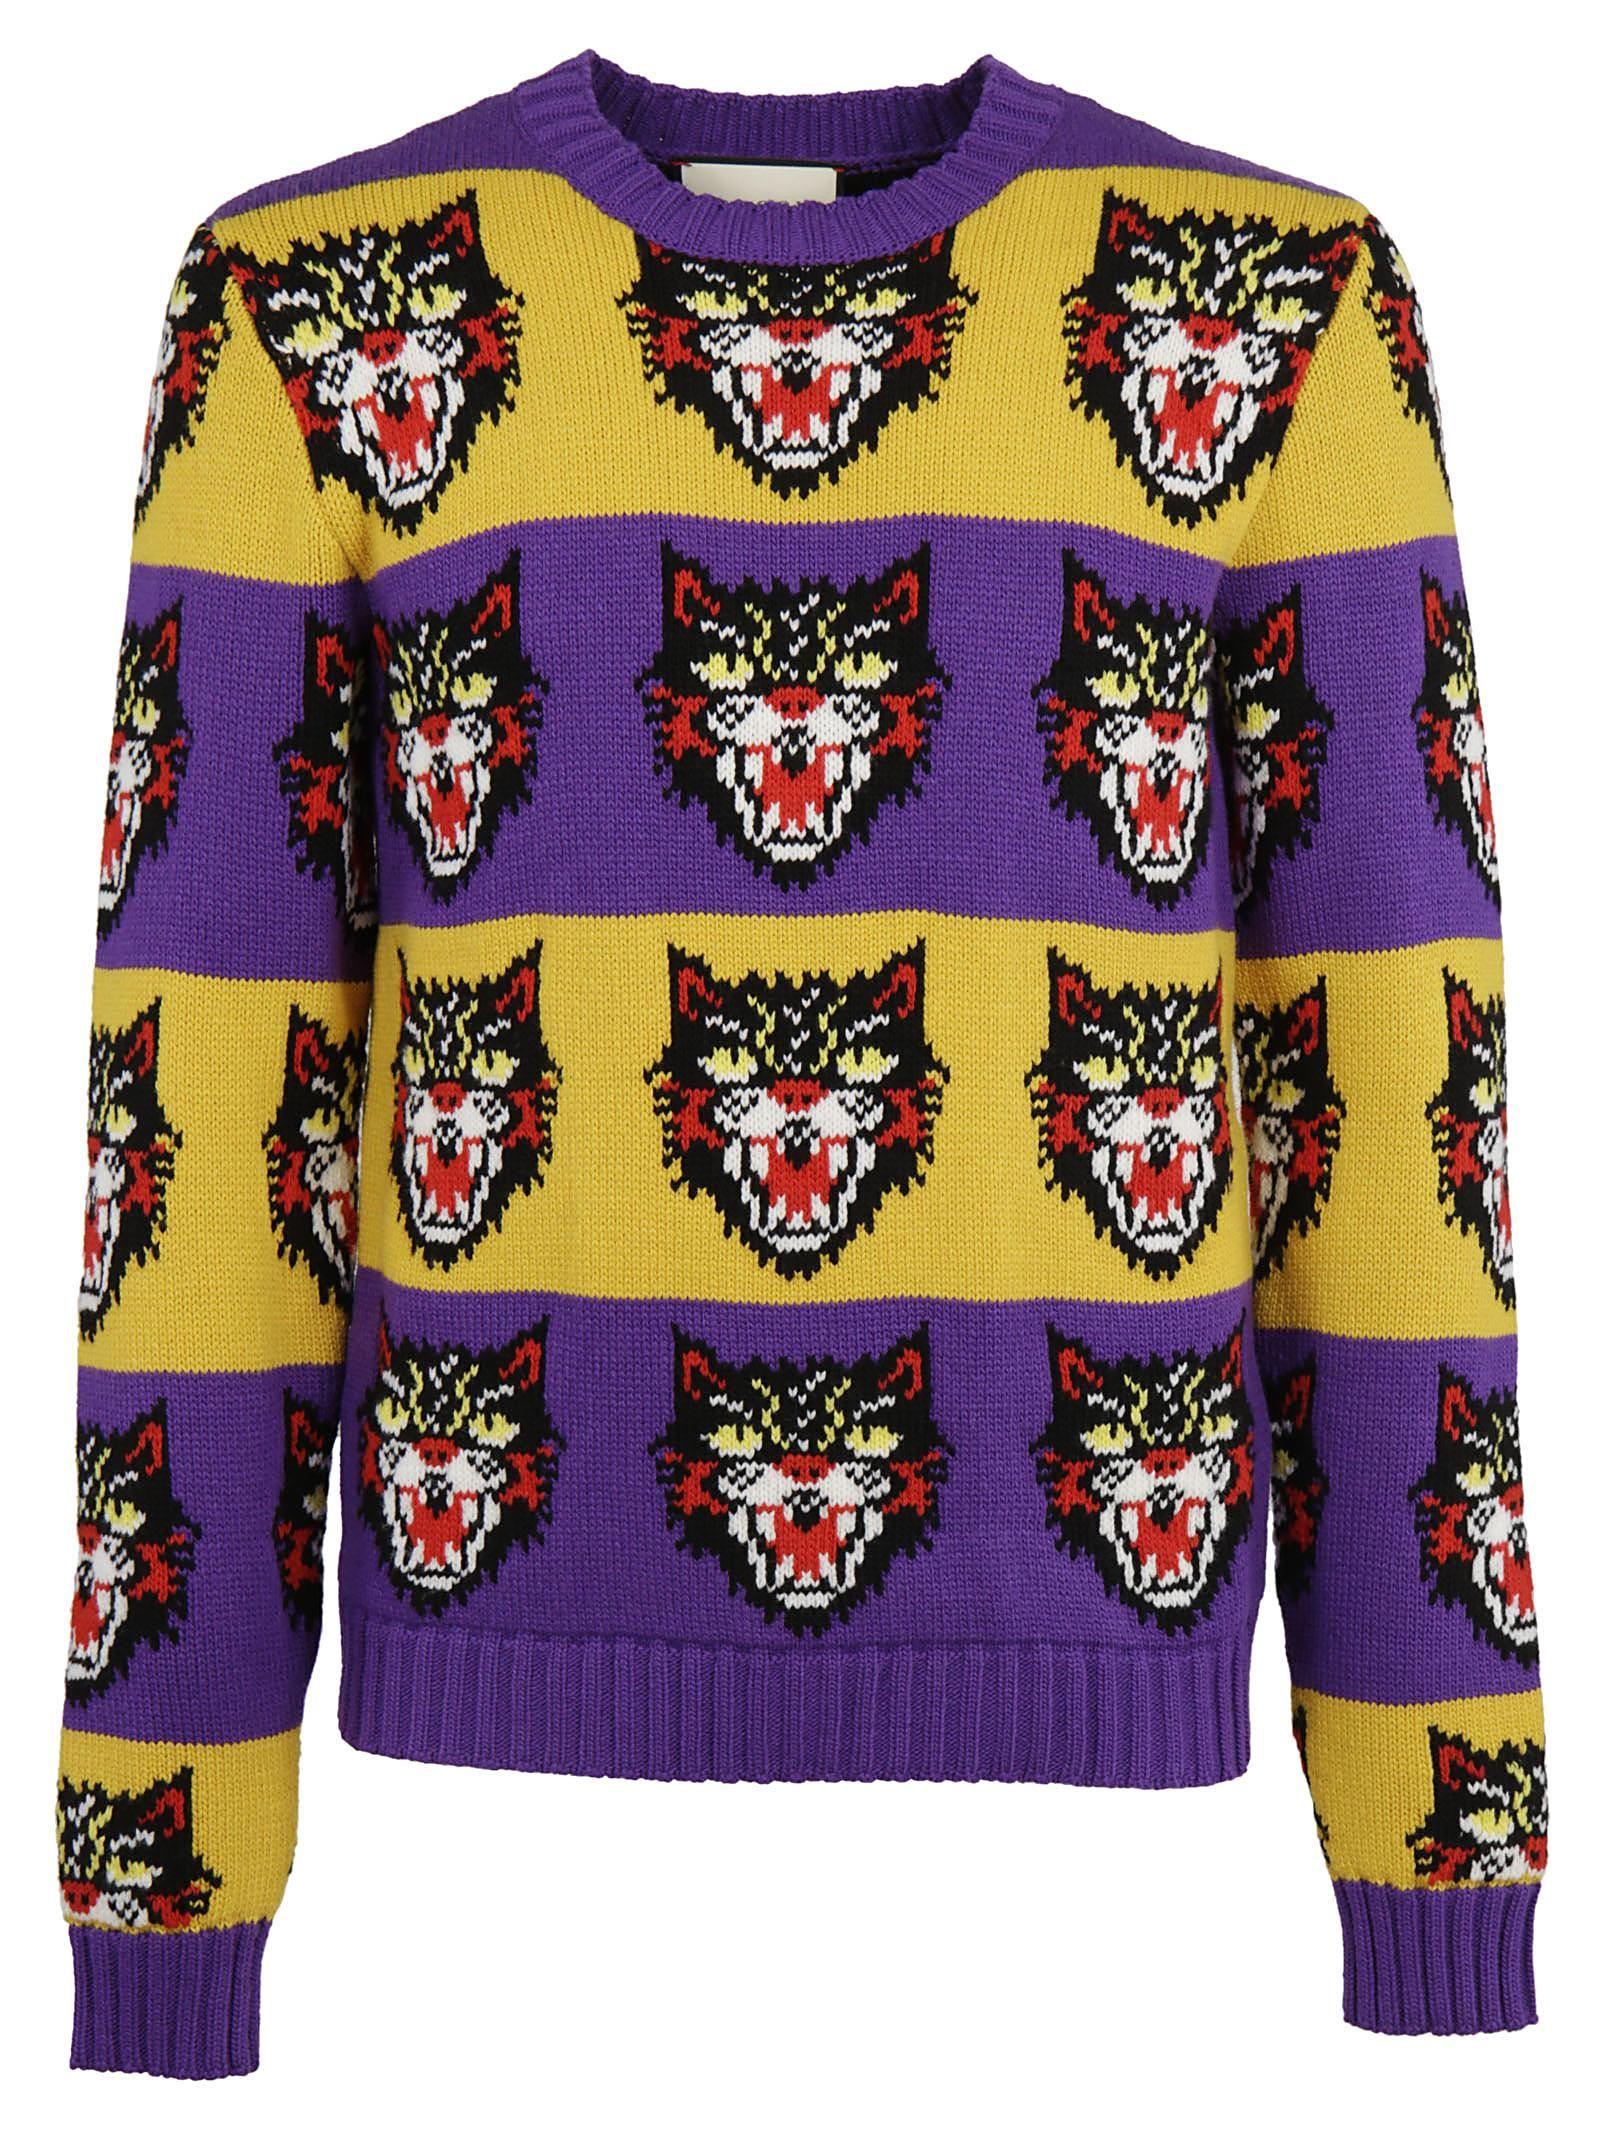 GUCCI Wool Cat Jacquard Knit Striped Sweater in Purple | ModeSens